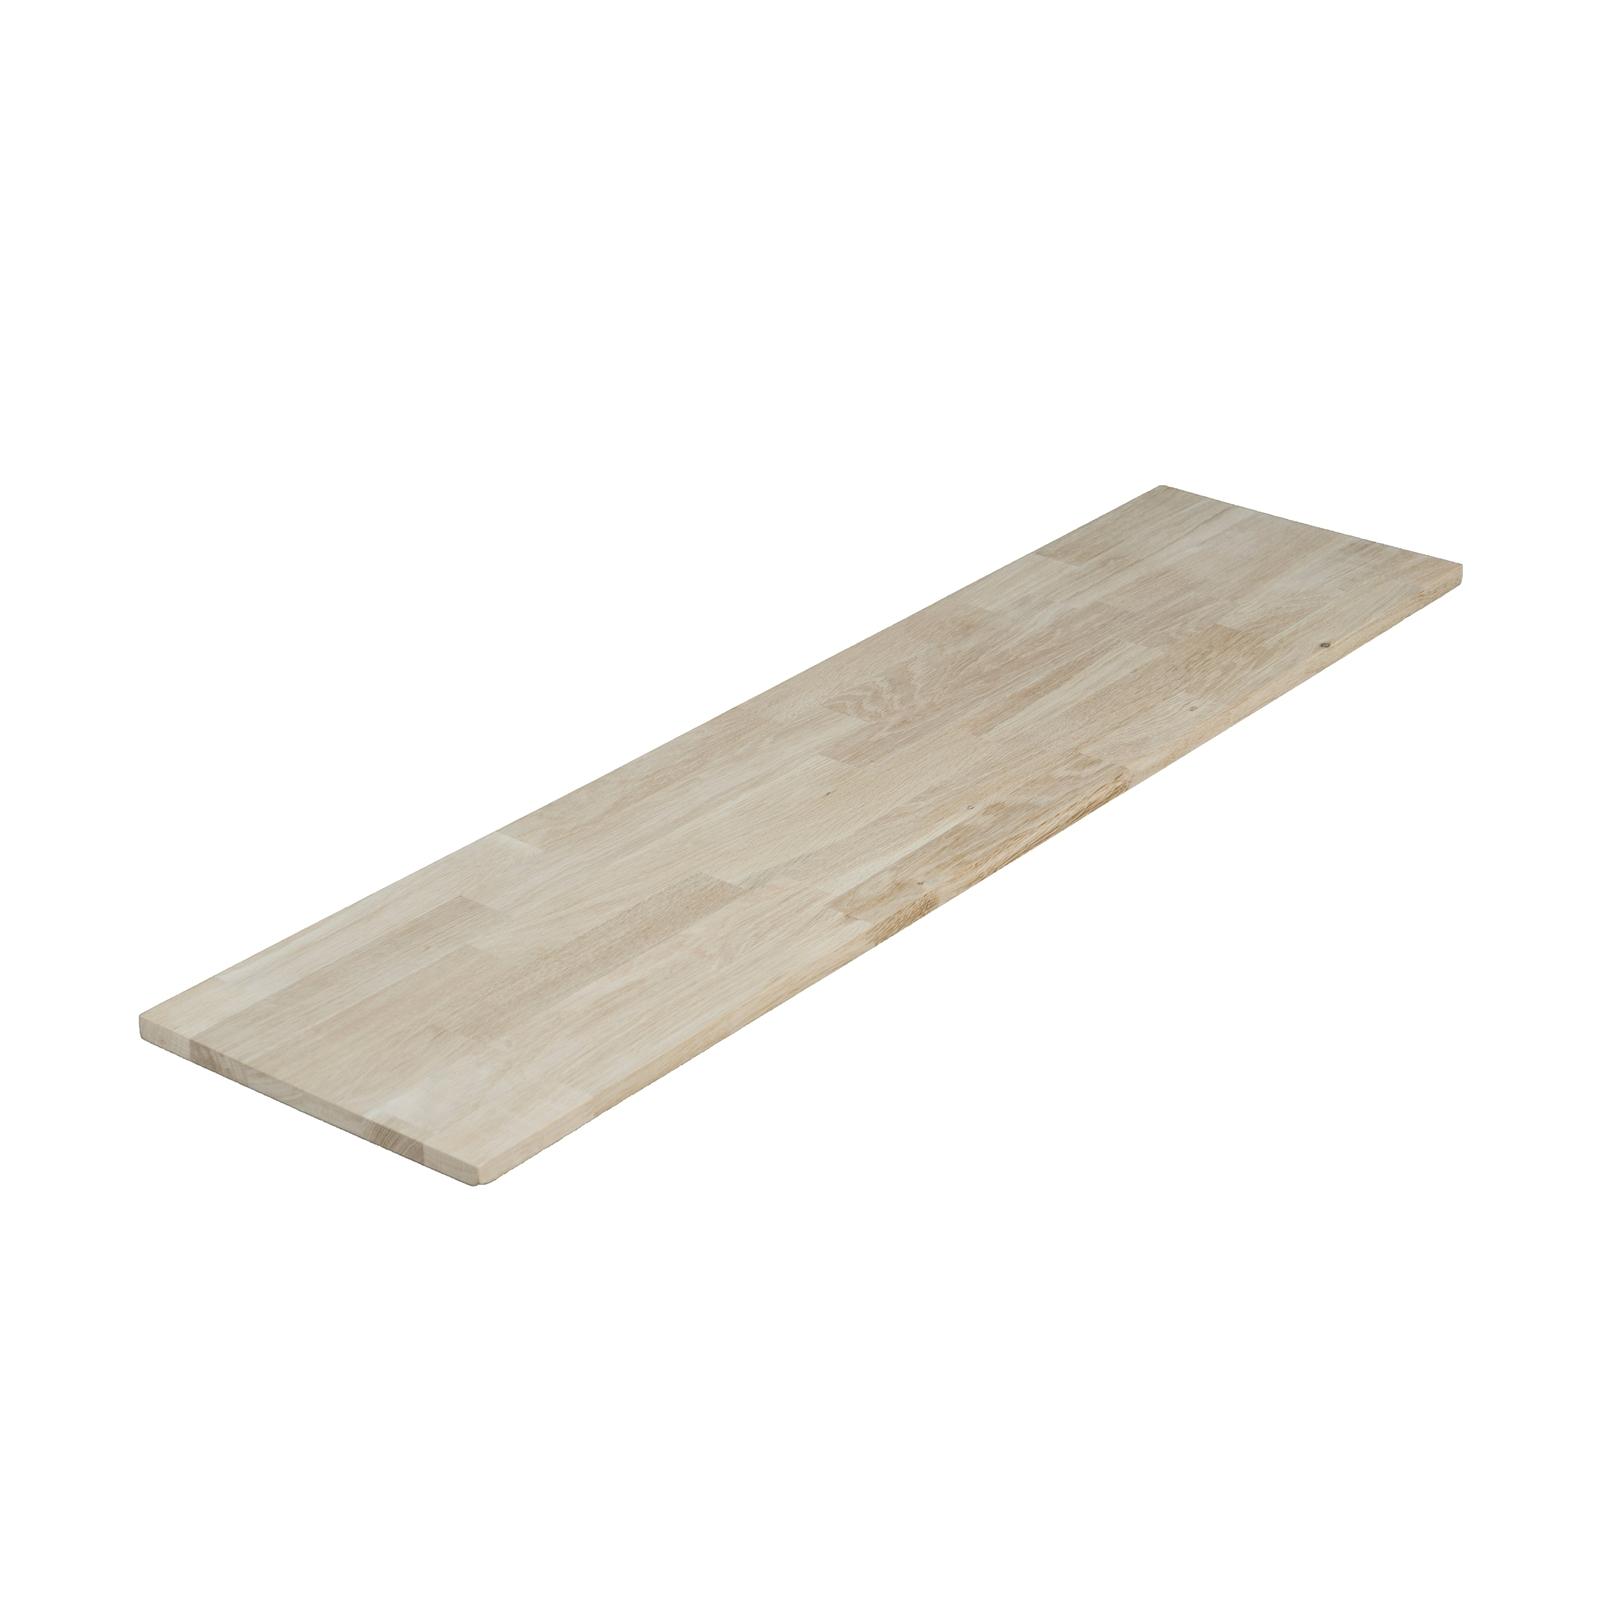 1200 x 300 x 18mm Finger Jointed Oak Panel